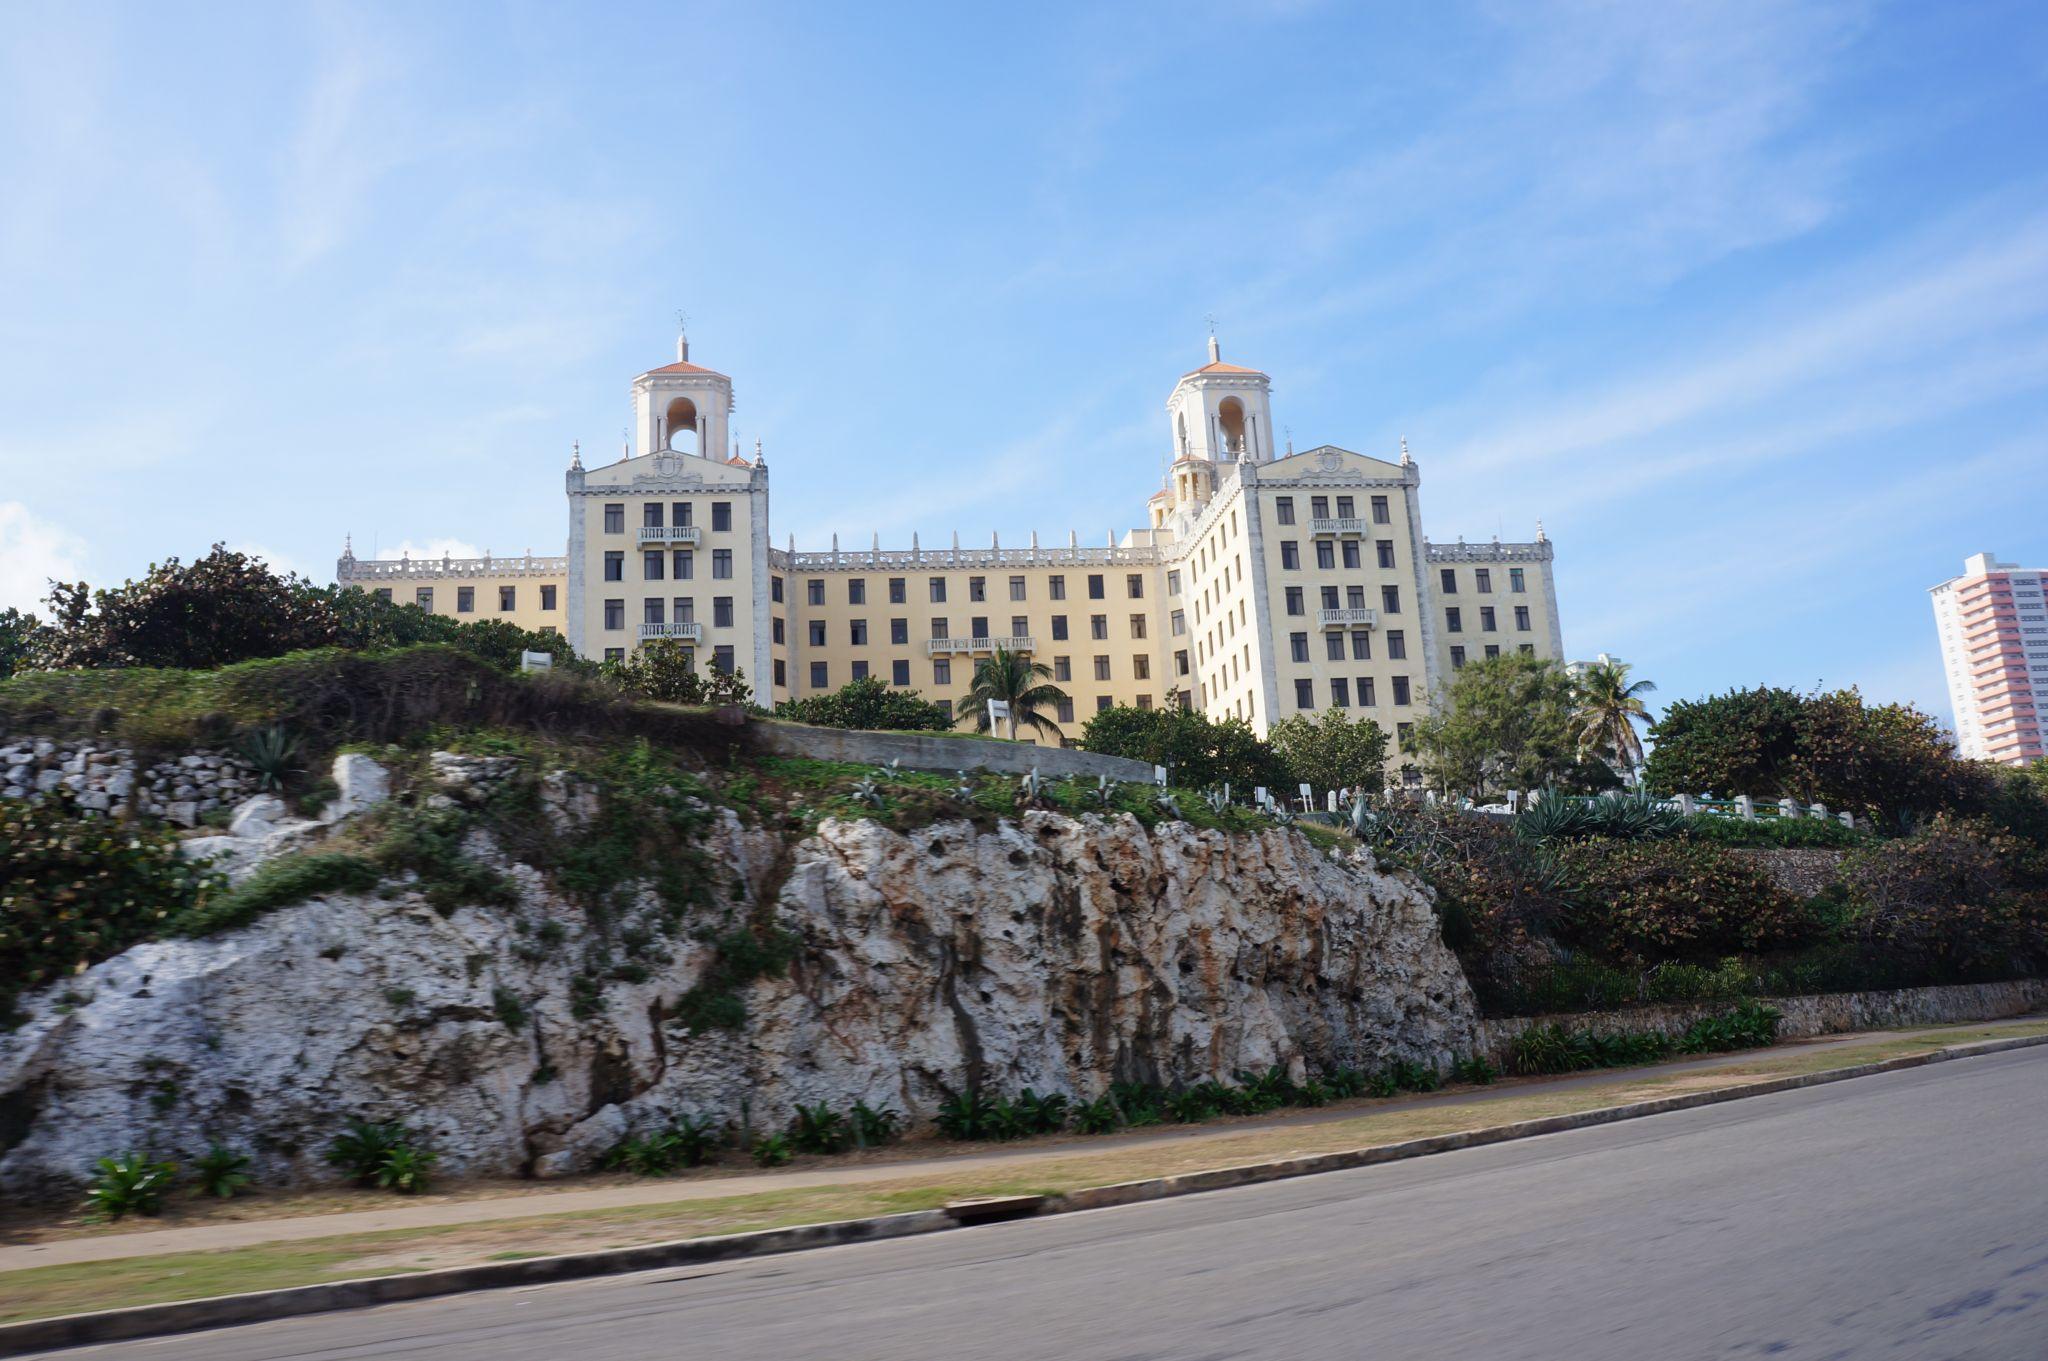 Hotel Nacional in Havana, Cuba